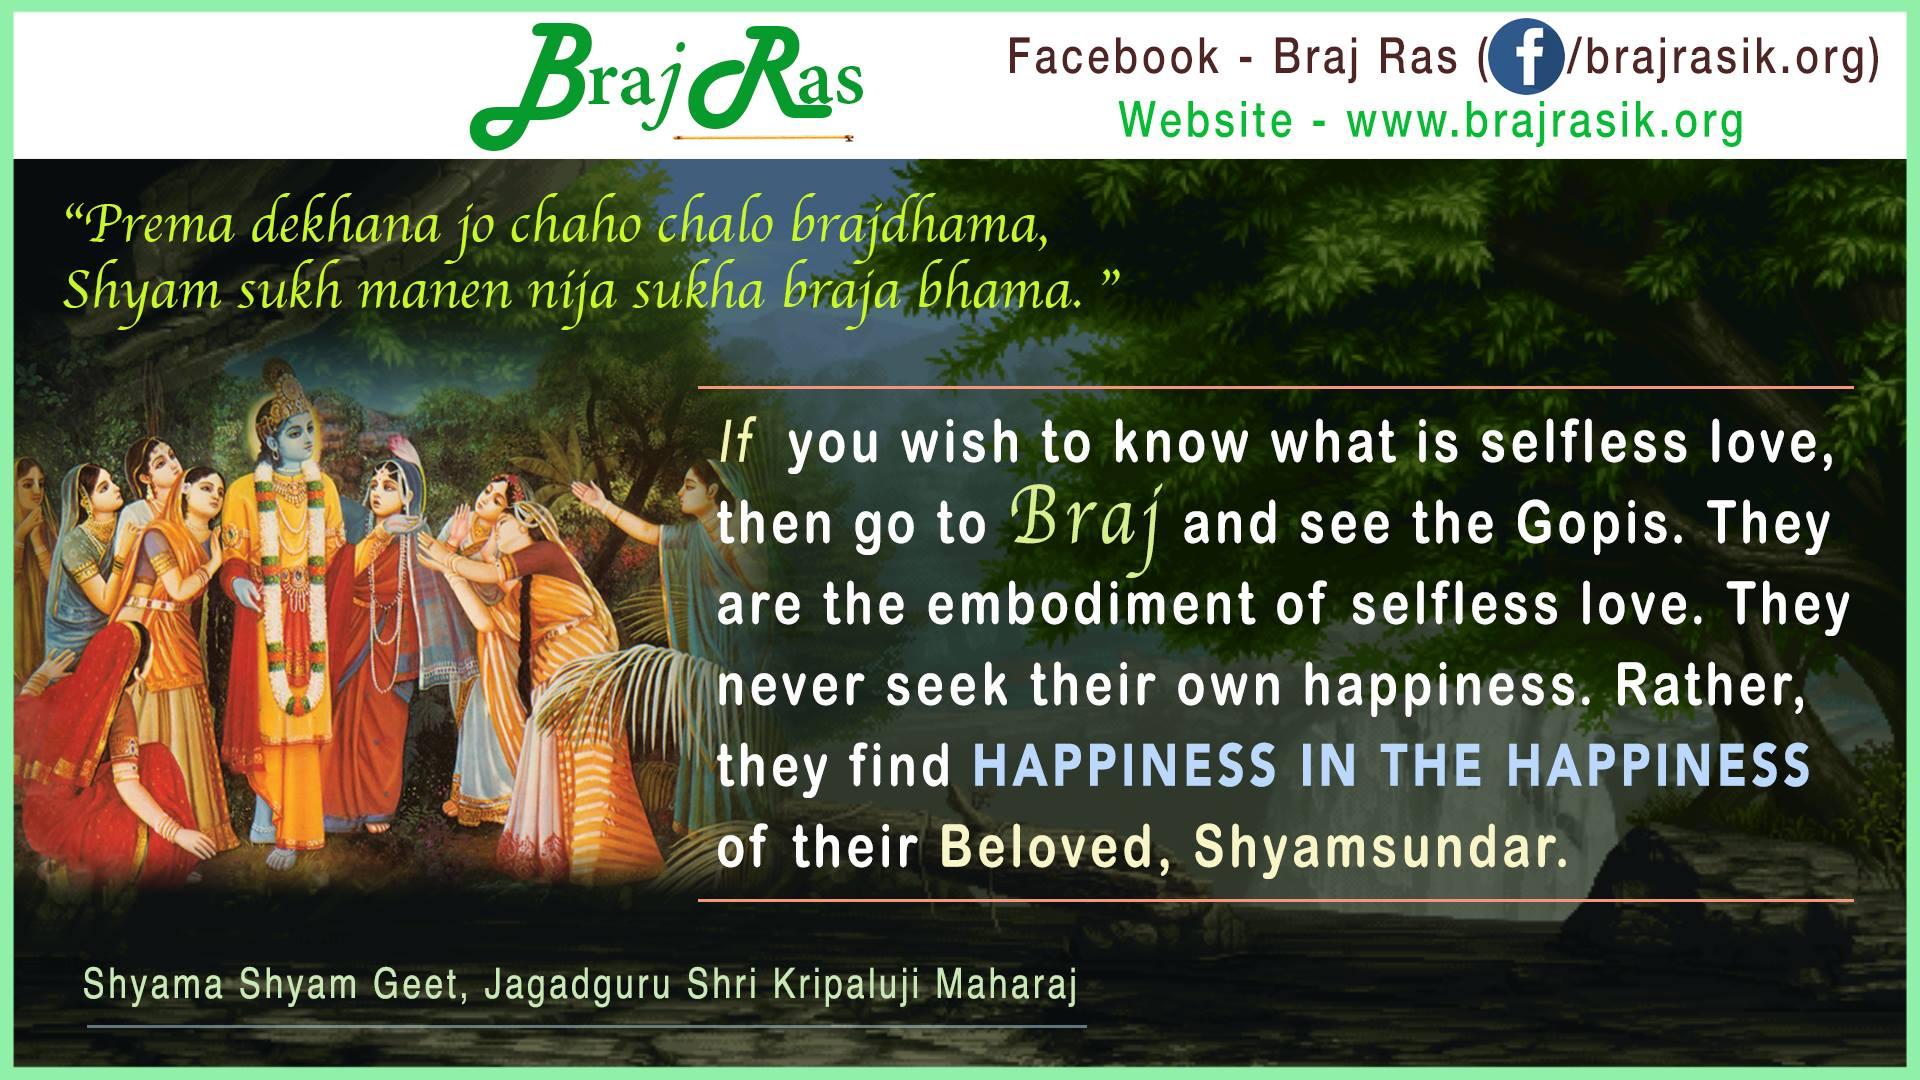 Prema dekhana jo chaho chalo brajdhama - Shyama Shyam Geet